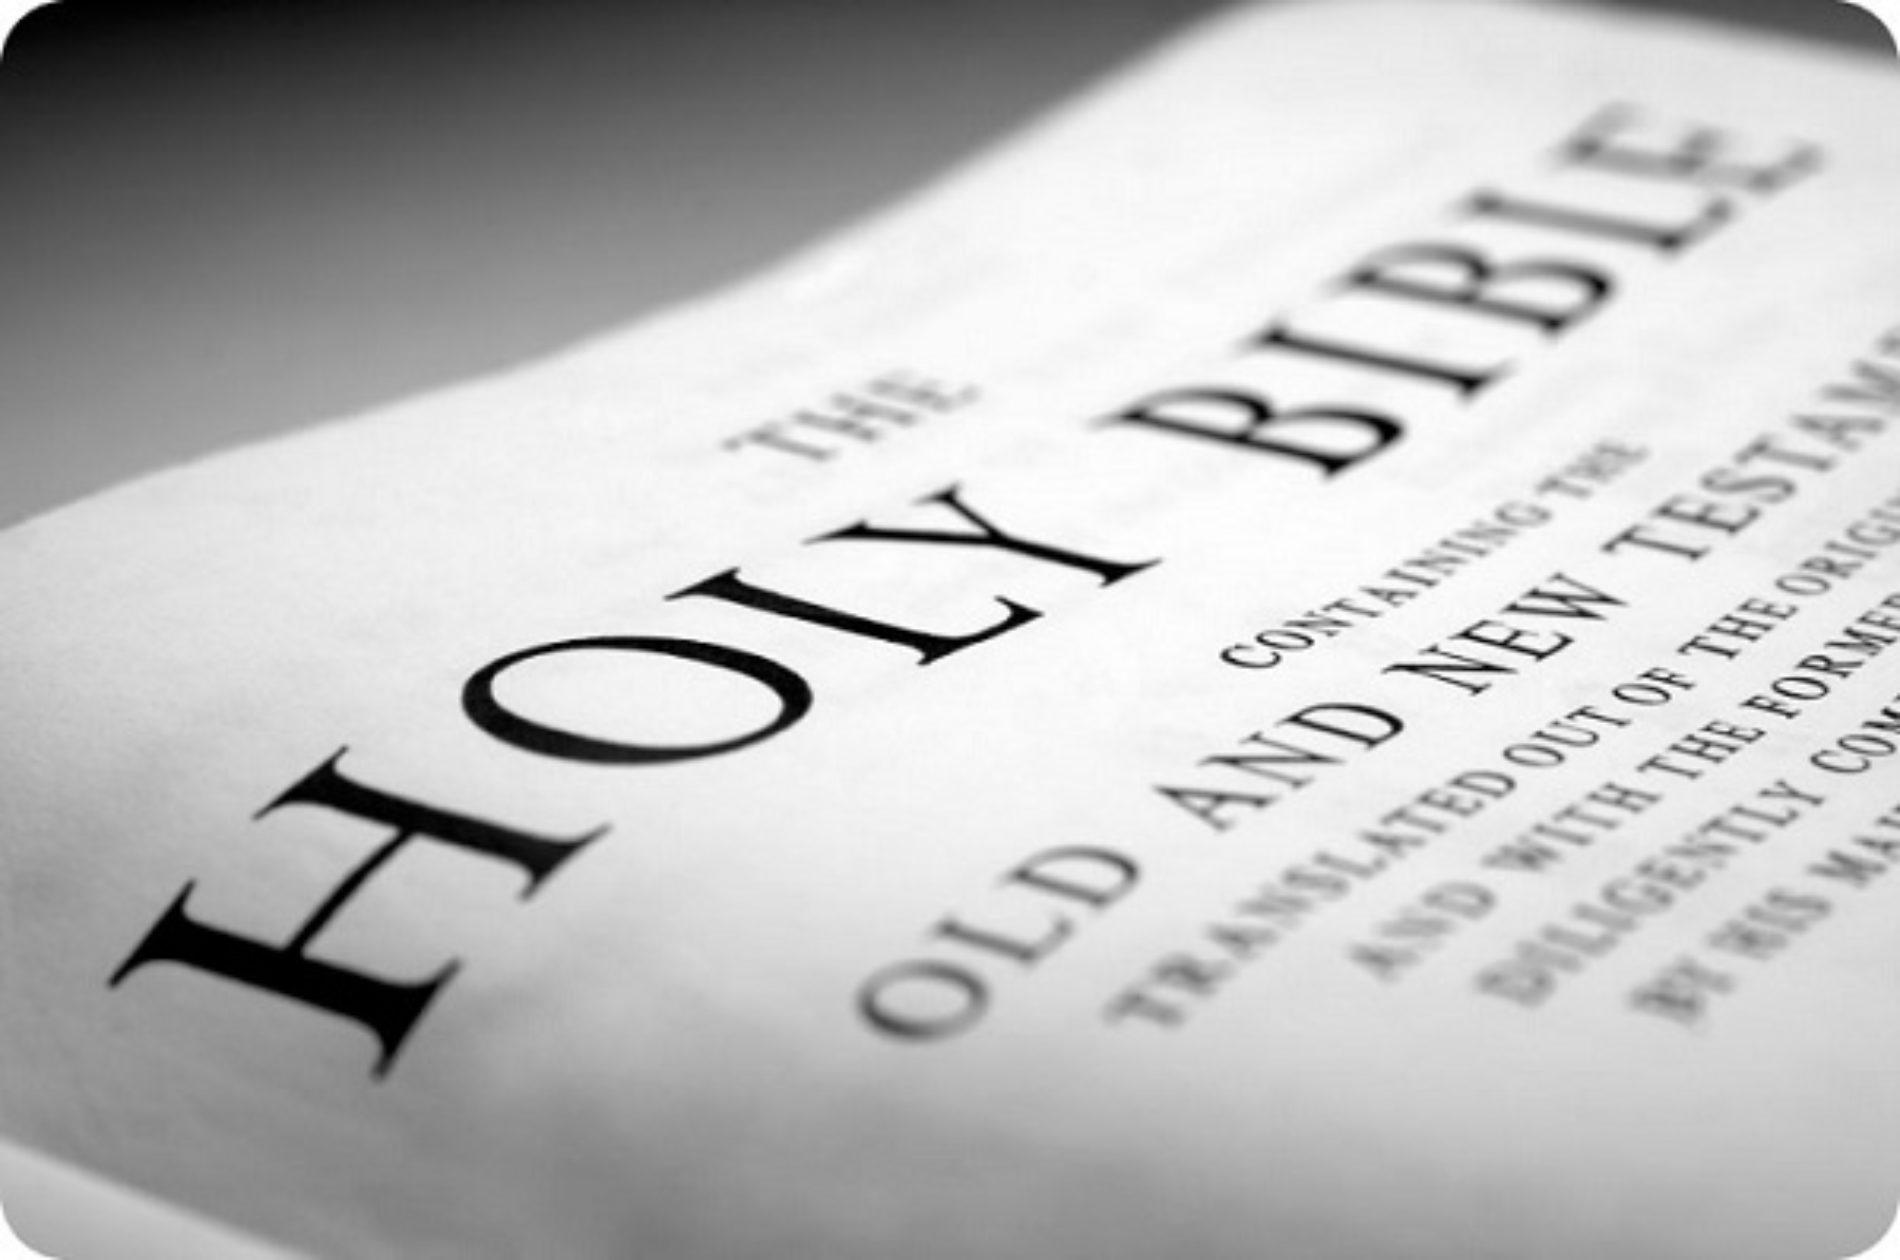 The Bible: A Homophobic Manual?